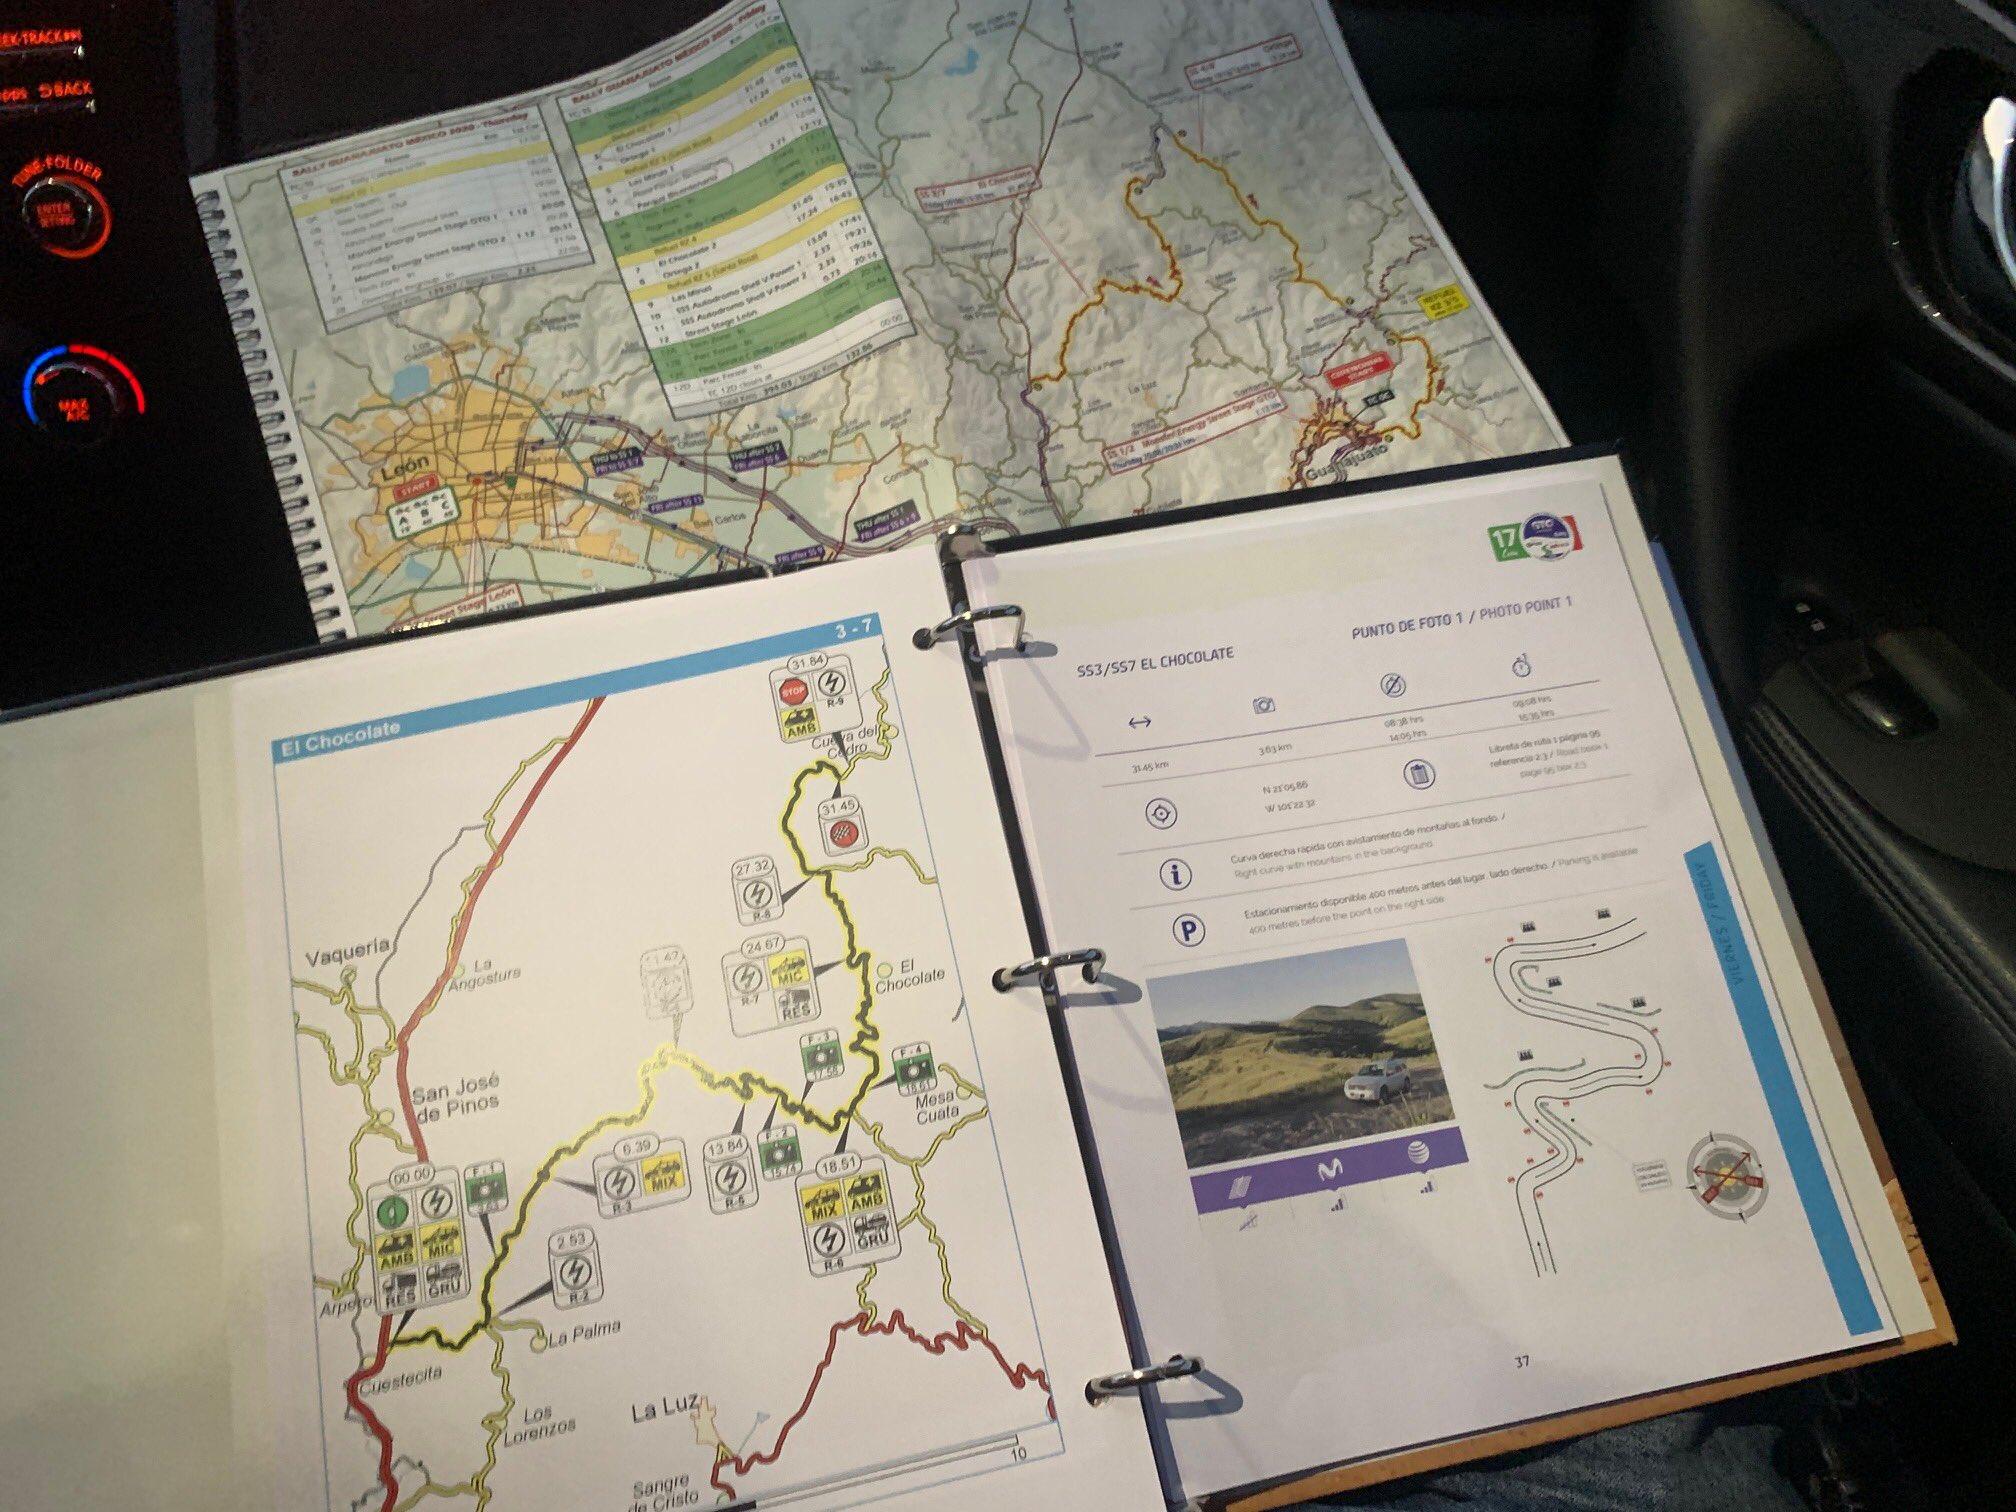 WRC: 17º Rallye Guanajuato Corona - México [12-15 Marzo] - Página 3 ES_axL9UYAcJT_E?format=jpg&name=large